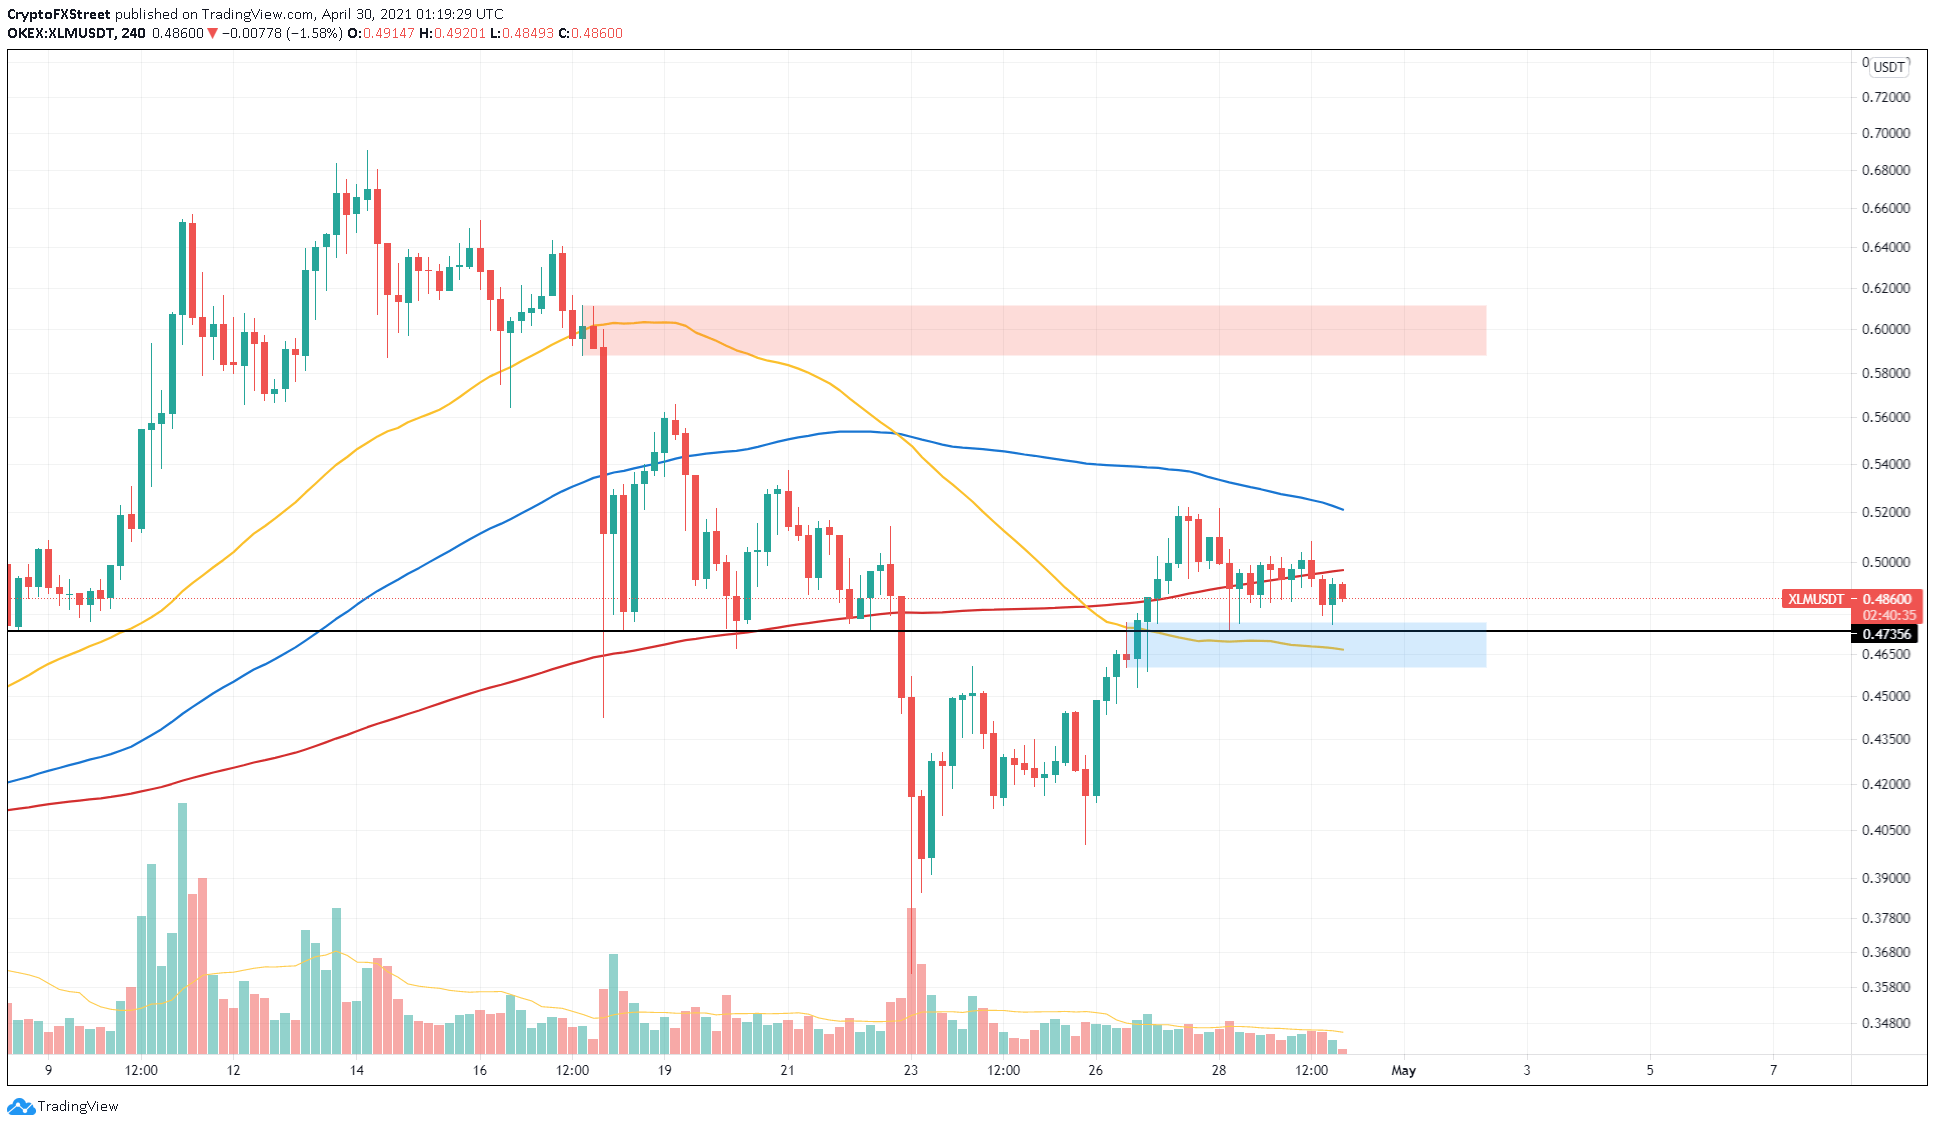 XLM/USDT 4-hour chart